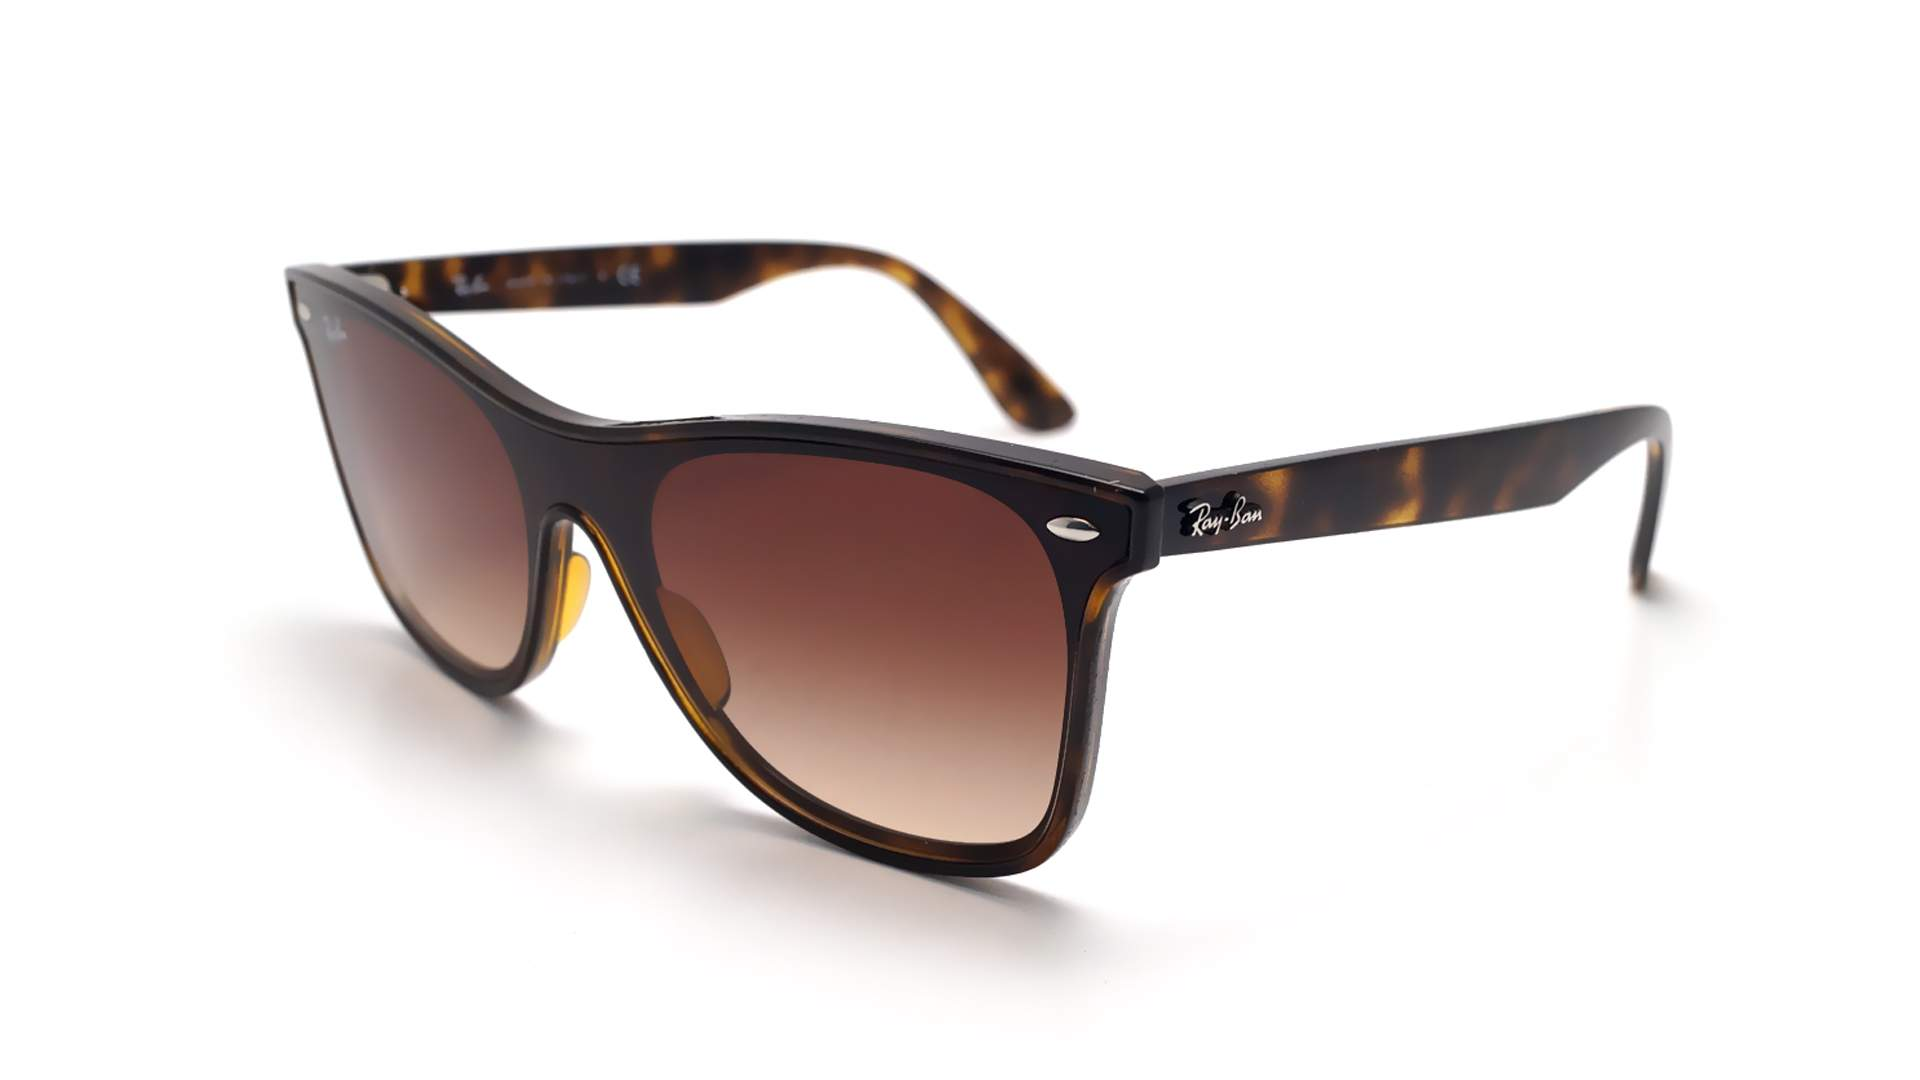 lunettes ray ban wayfarer femme